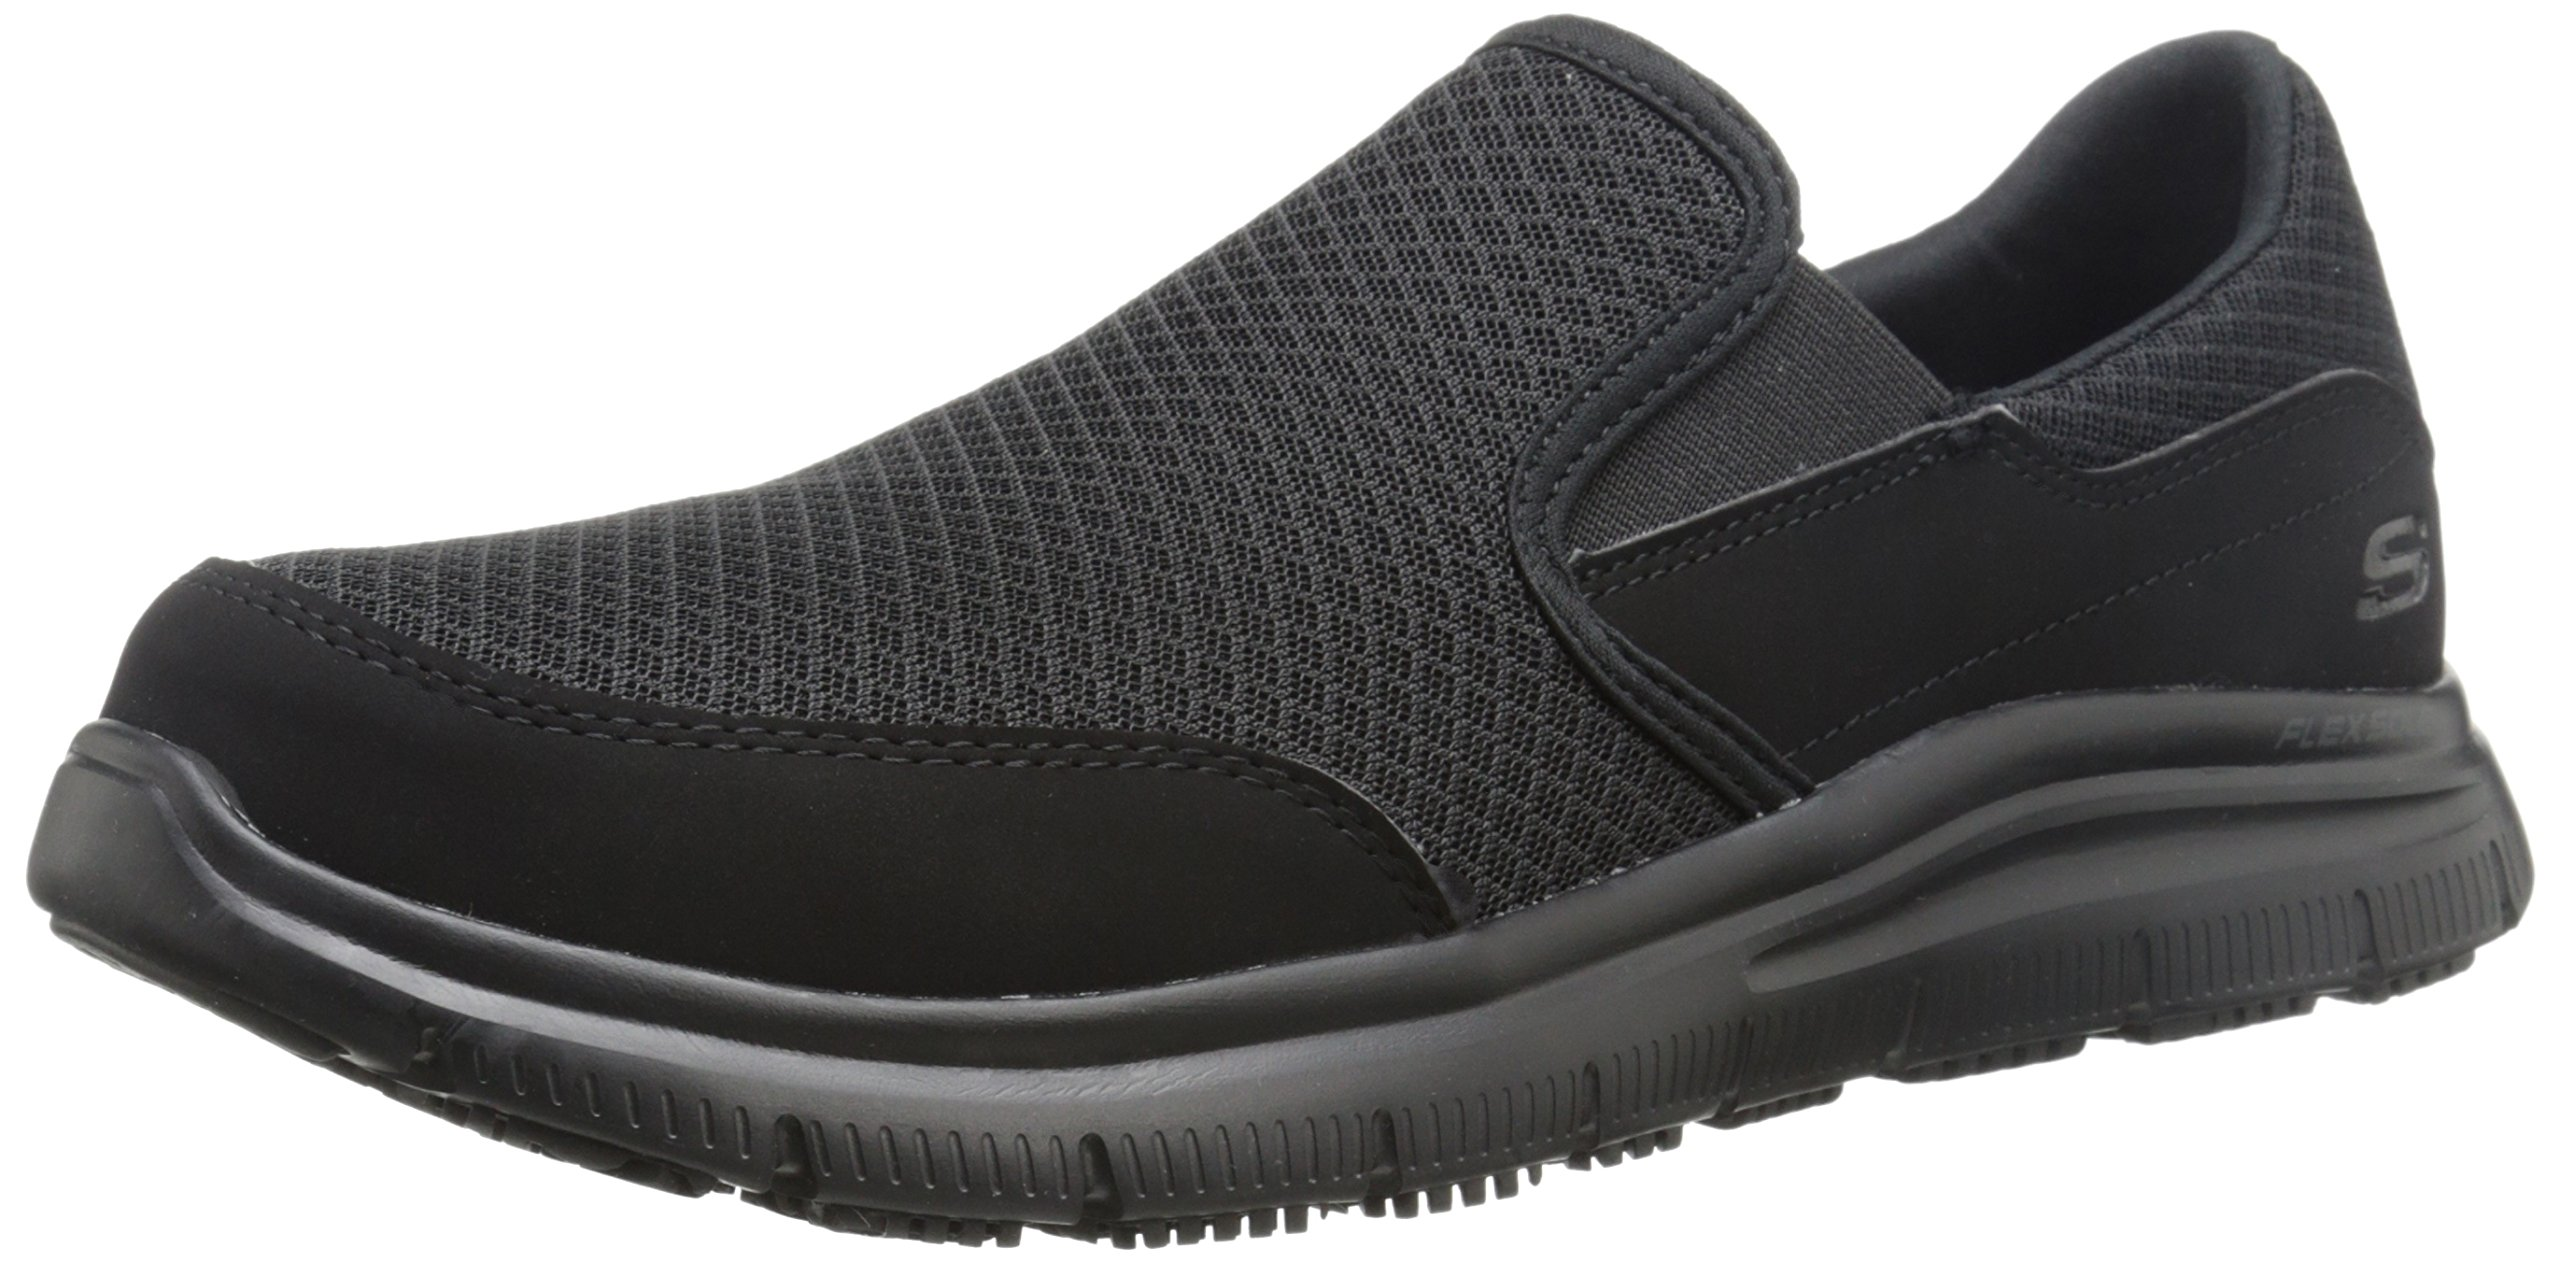 Skechers Men's Black Flex Advantage Slip Resistant Mcallen Slip On - 9 D(M) US by Skechers